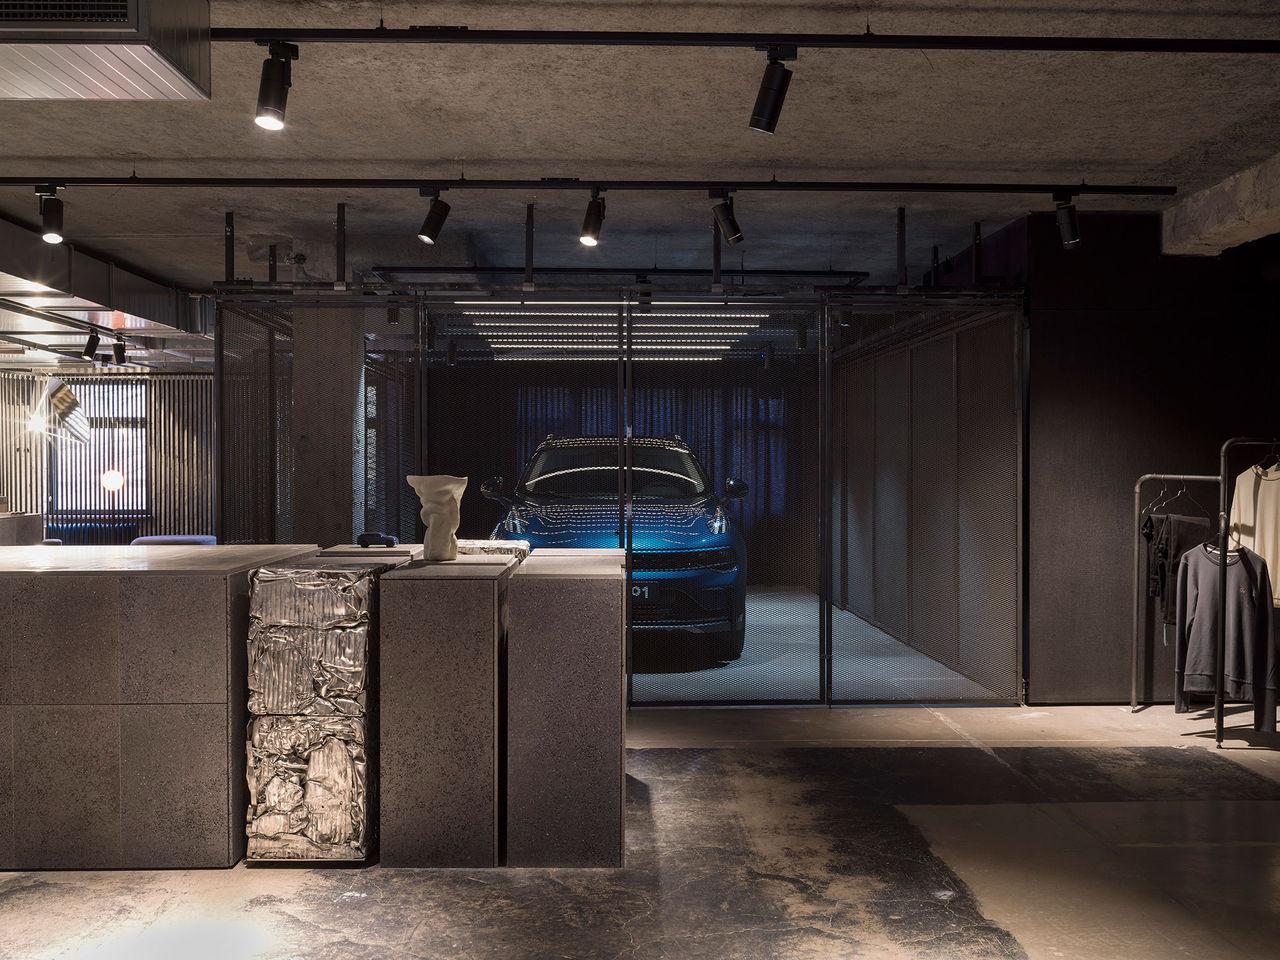 I dag öppnar Lynk & Co's klubb i Göteborg